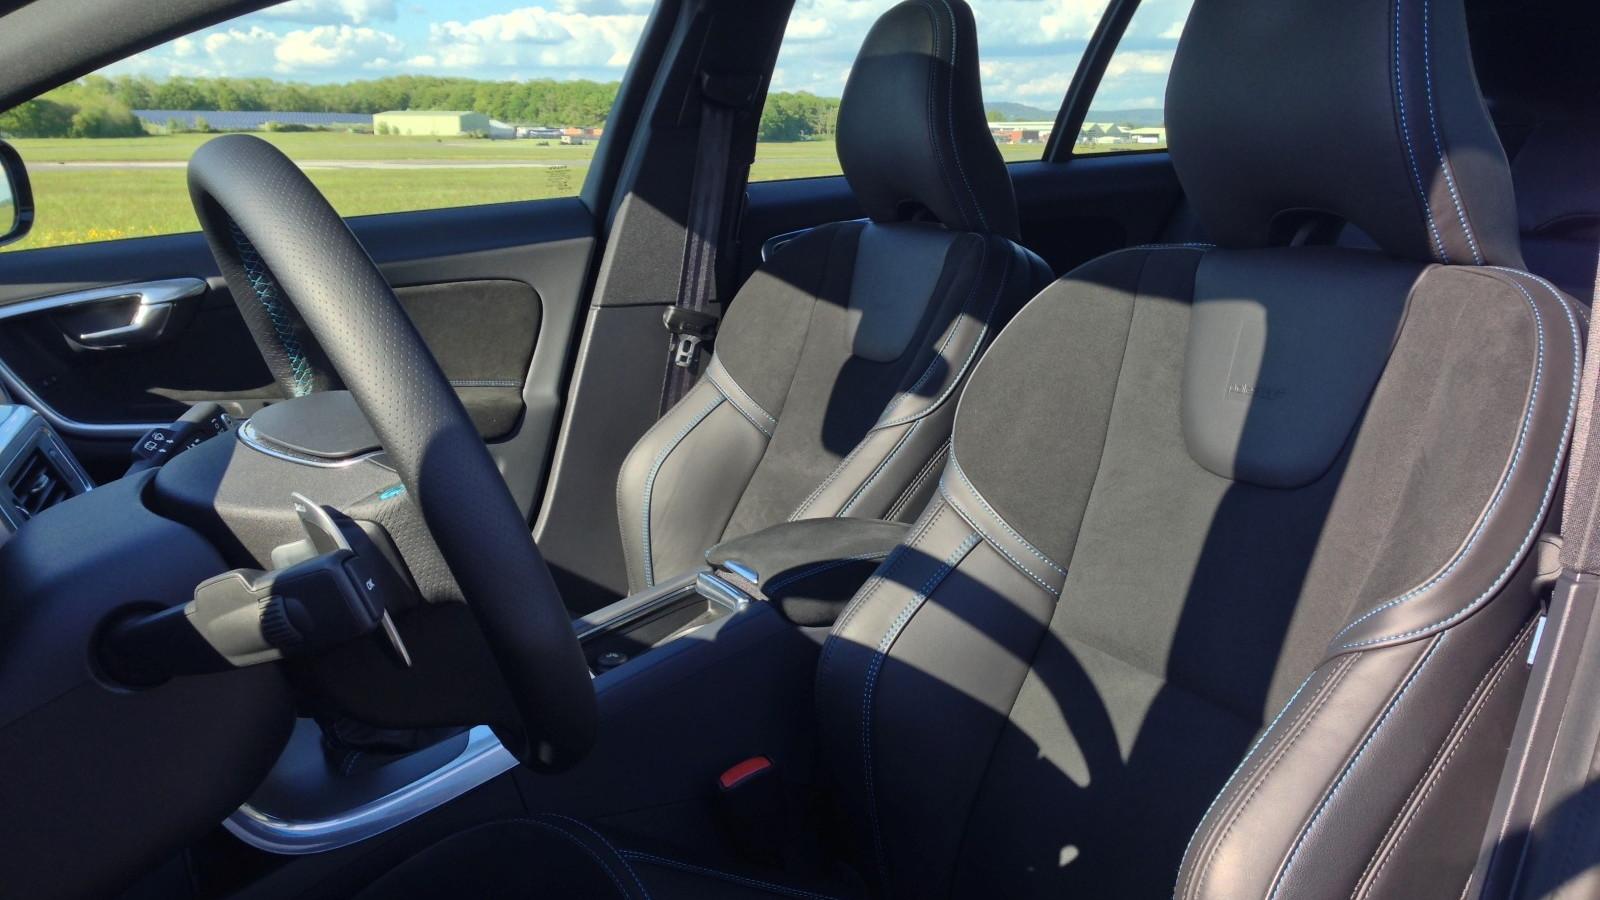 2015 Volvo V60 Polestar - quick drive